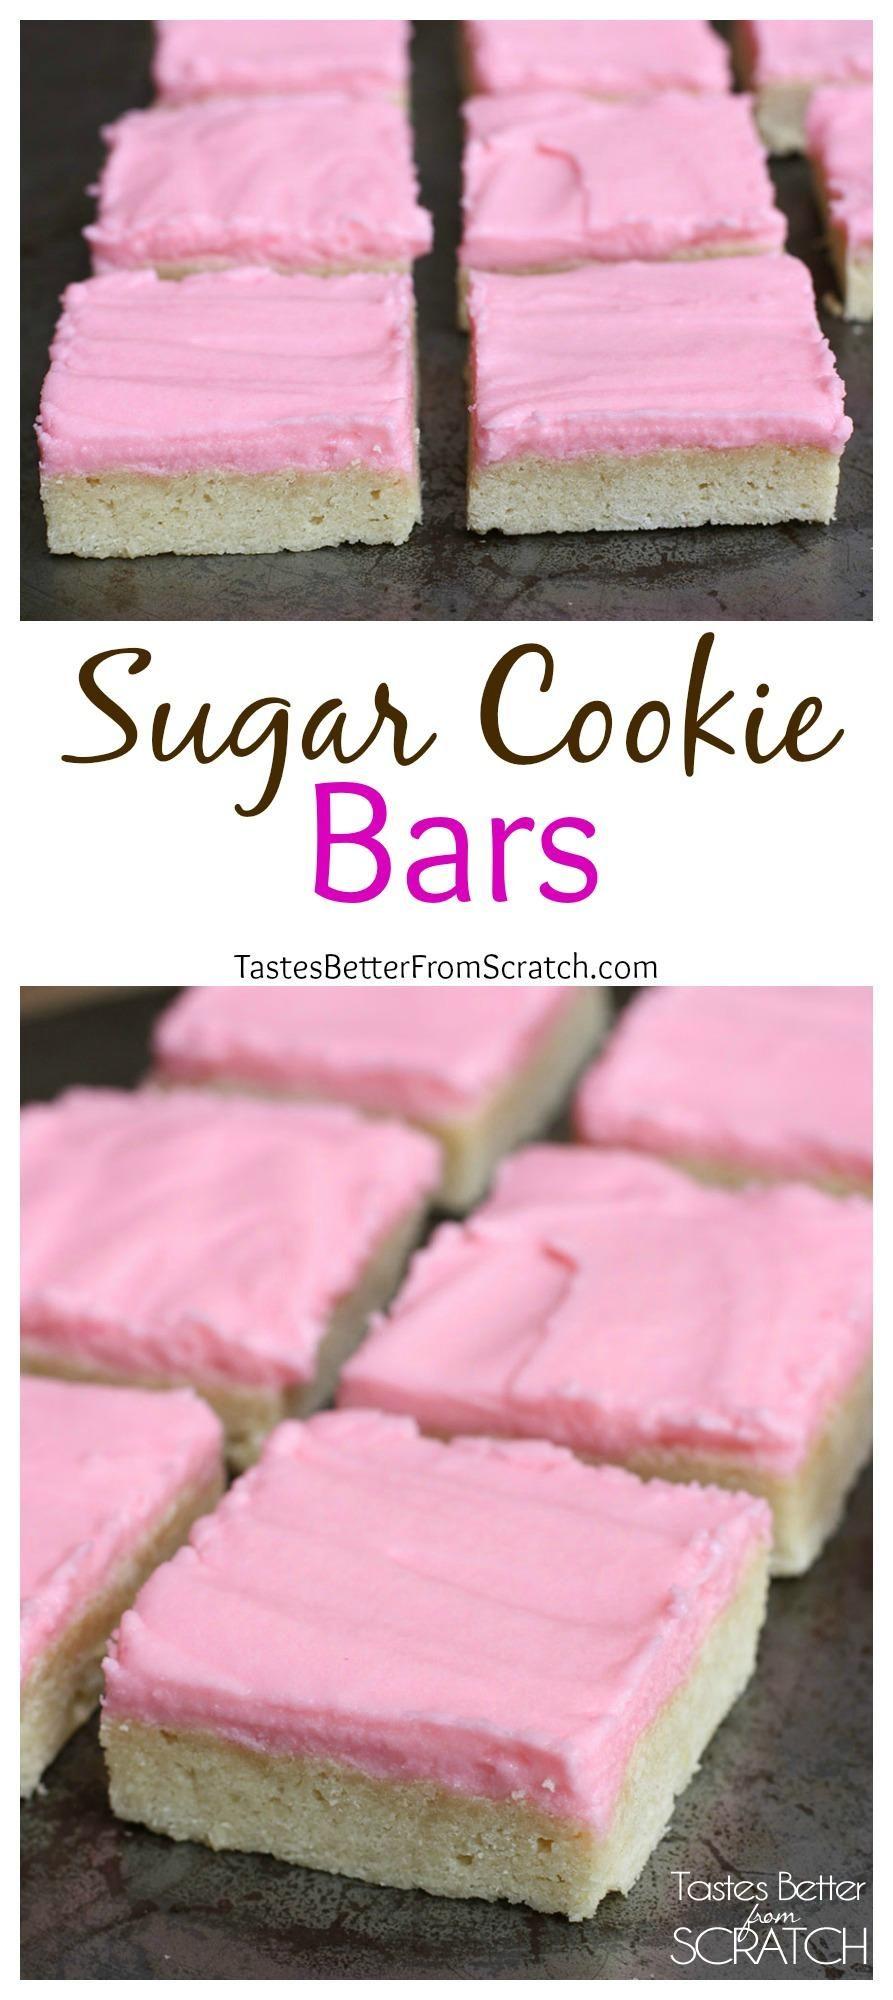 Sugar Cookie Bars on TastesBetterFromScratch.com